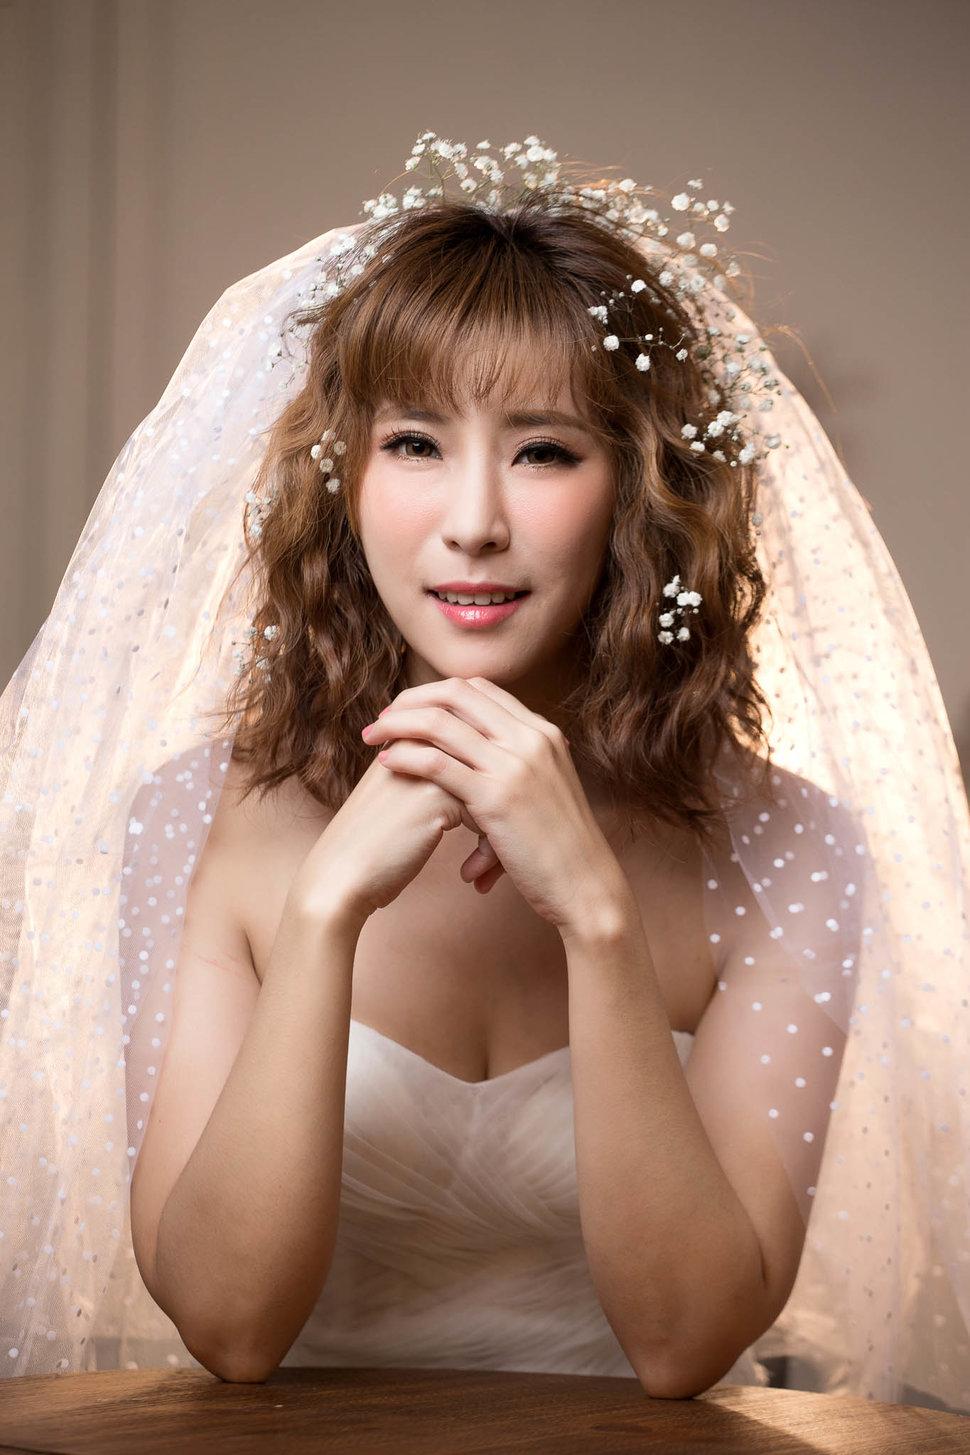 18PHOTO自主婚紗-潤兒(編號:406262) - 18PHOTO 婚紗影像攝影工作室 - 結婚吧一站式婚禮服務平台